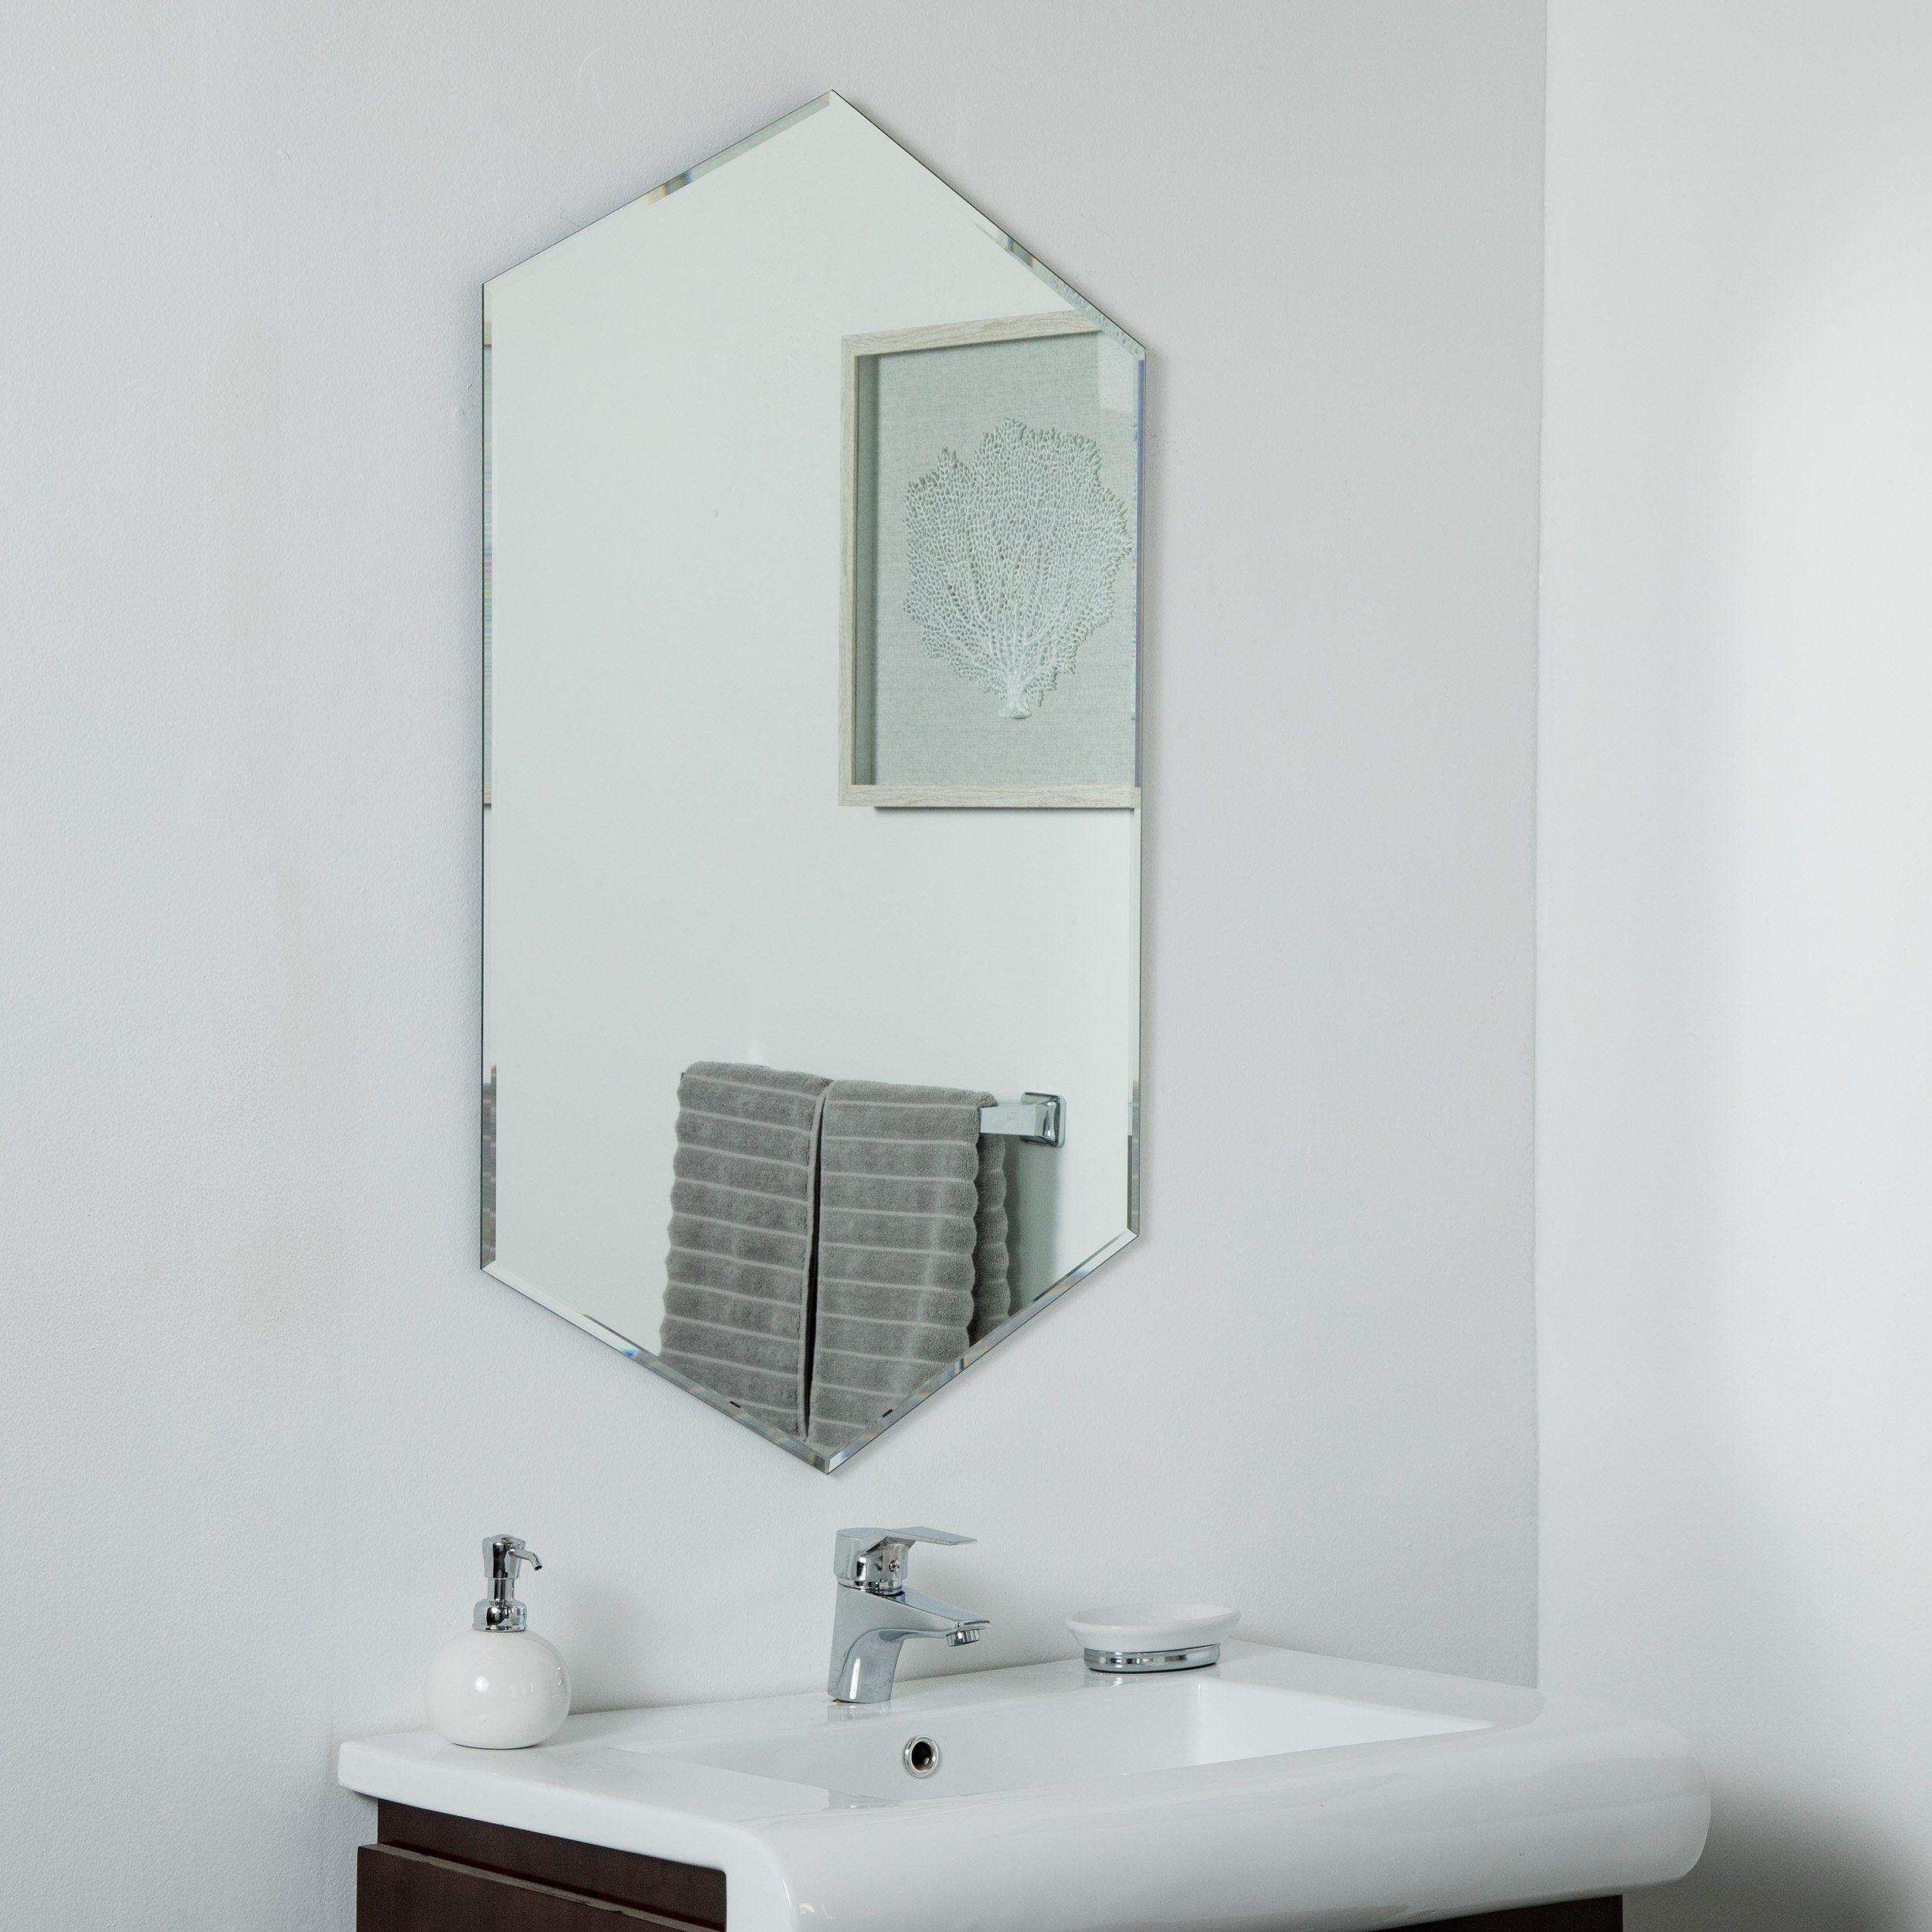 Gal Frameless Mirror 39 5 X 23 6 In Wall Mirror Silver Decor